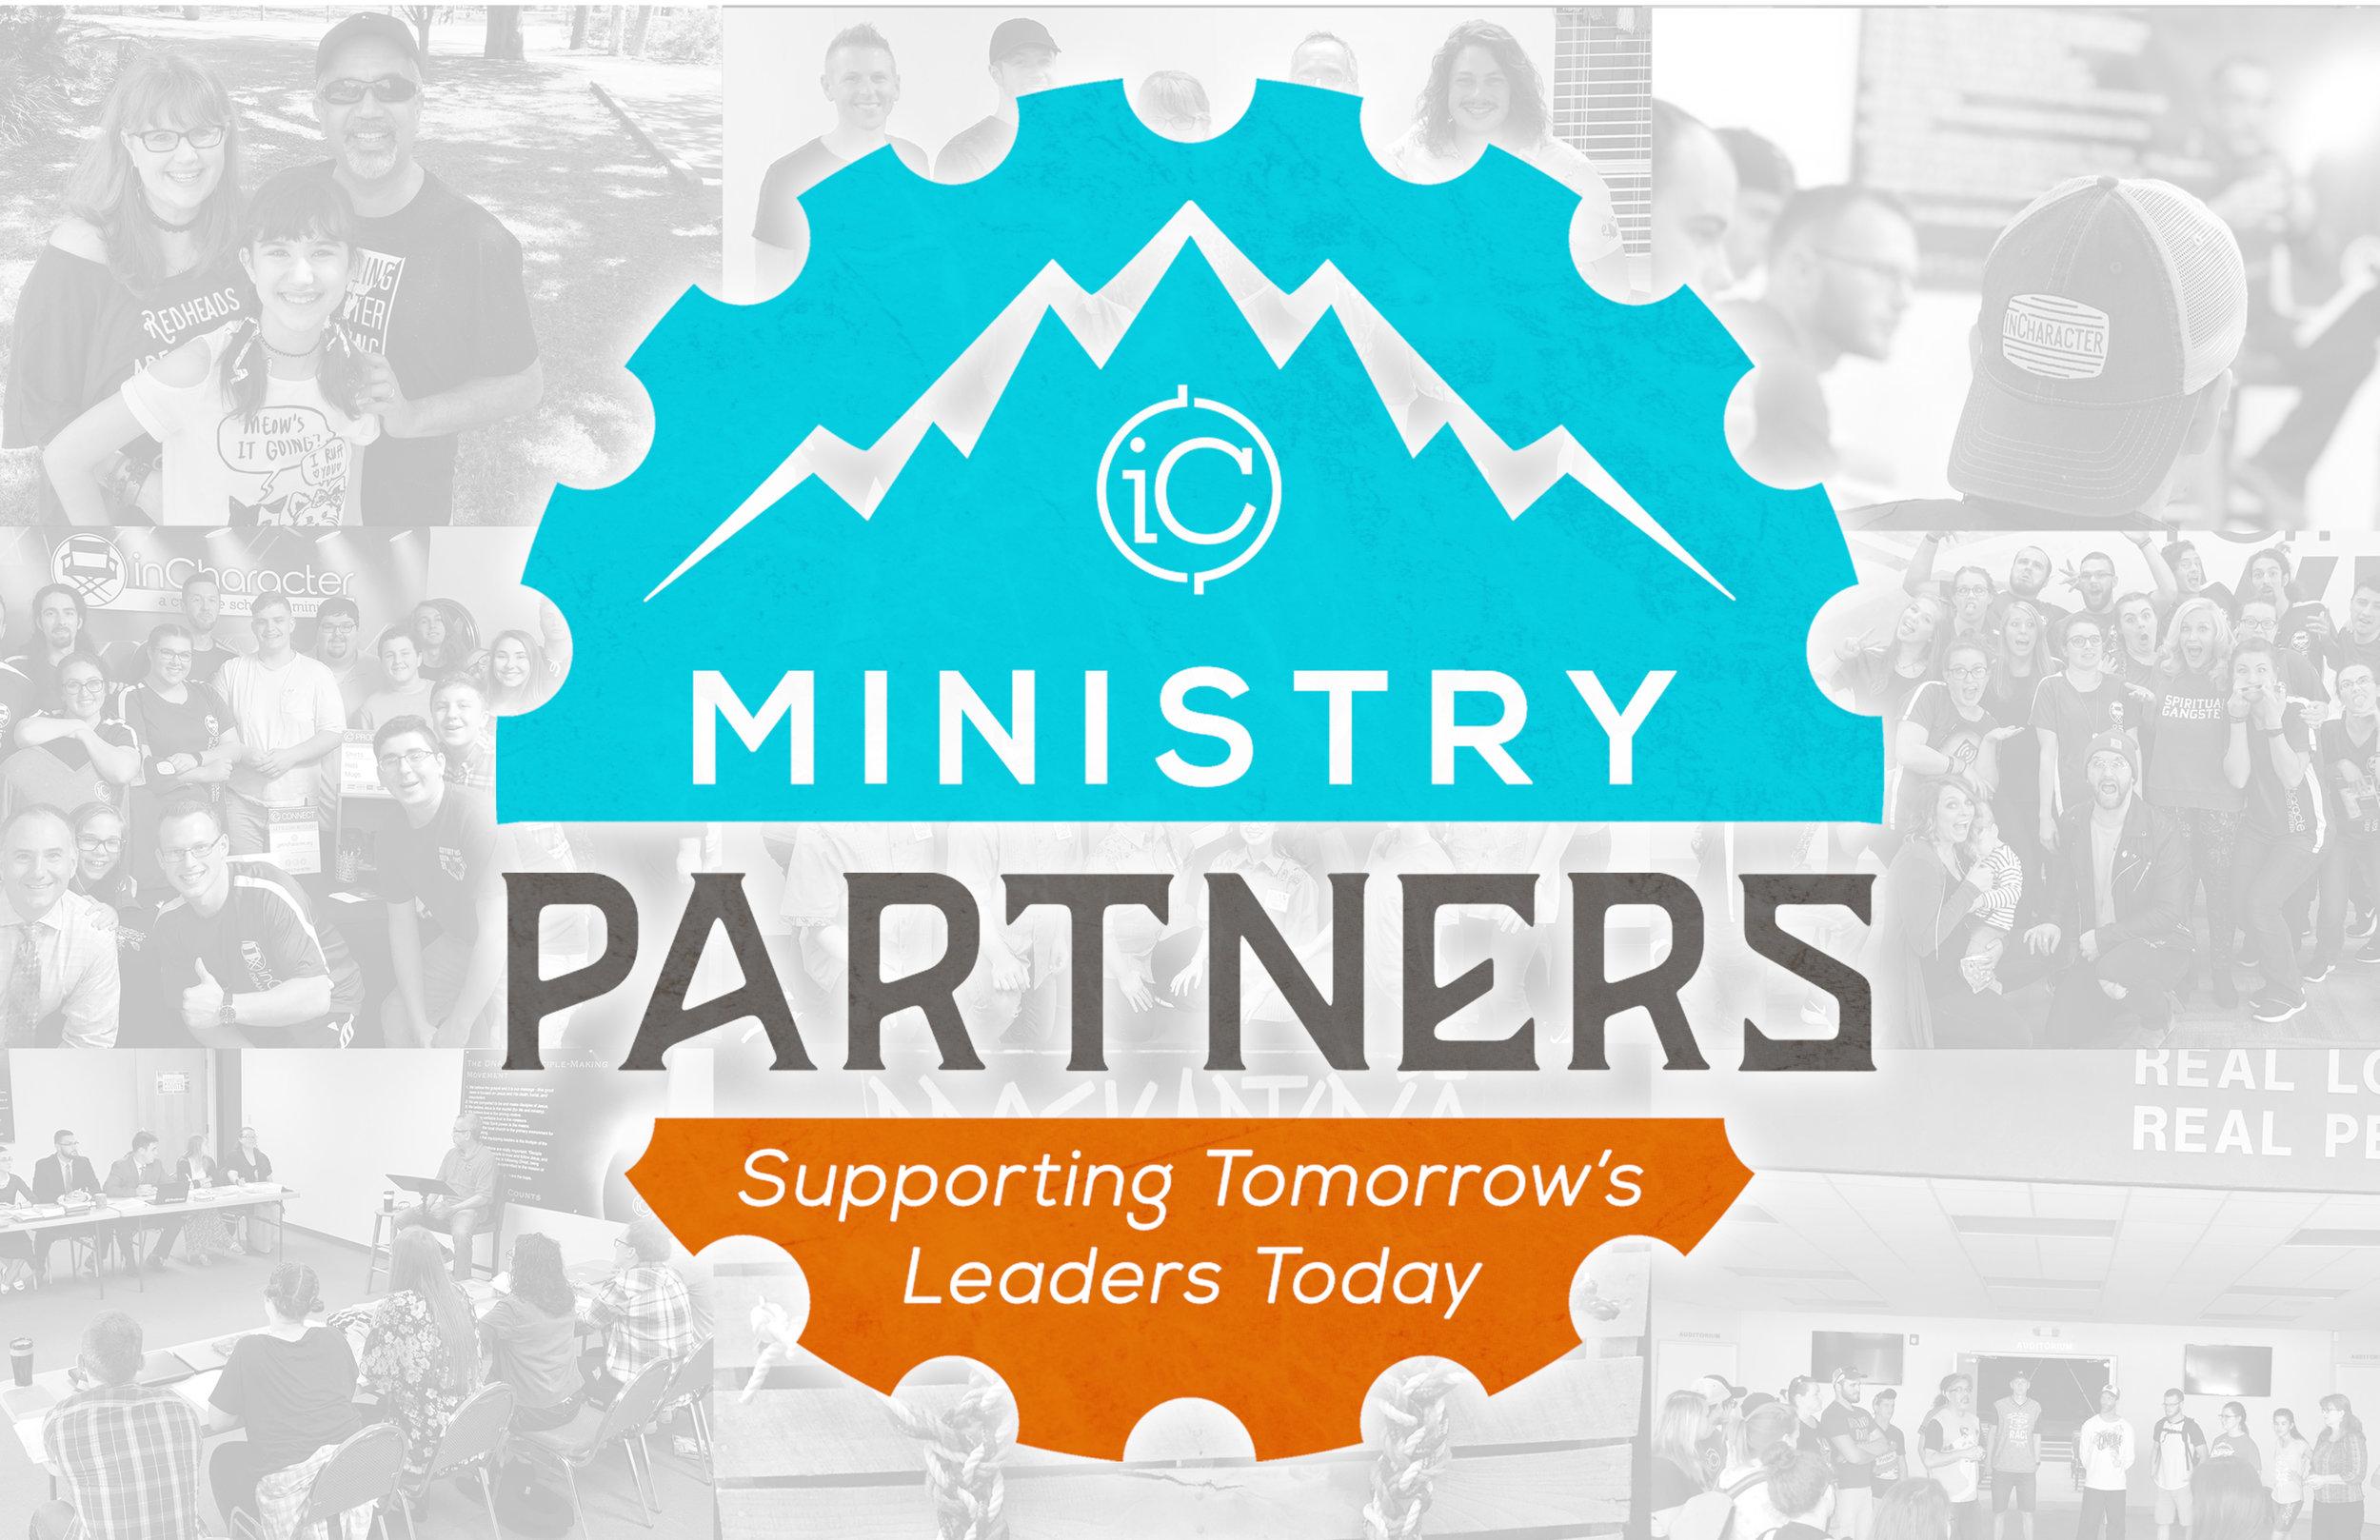 Ministry Partners iC Slide1.jpg